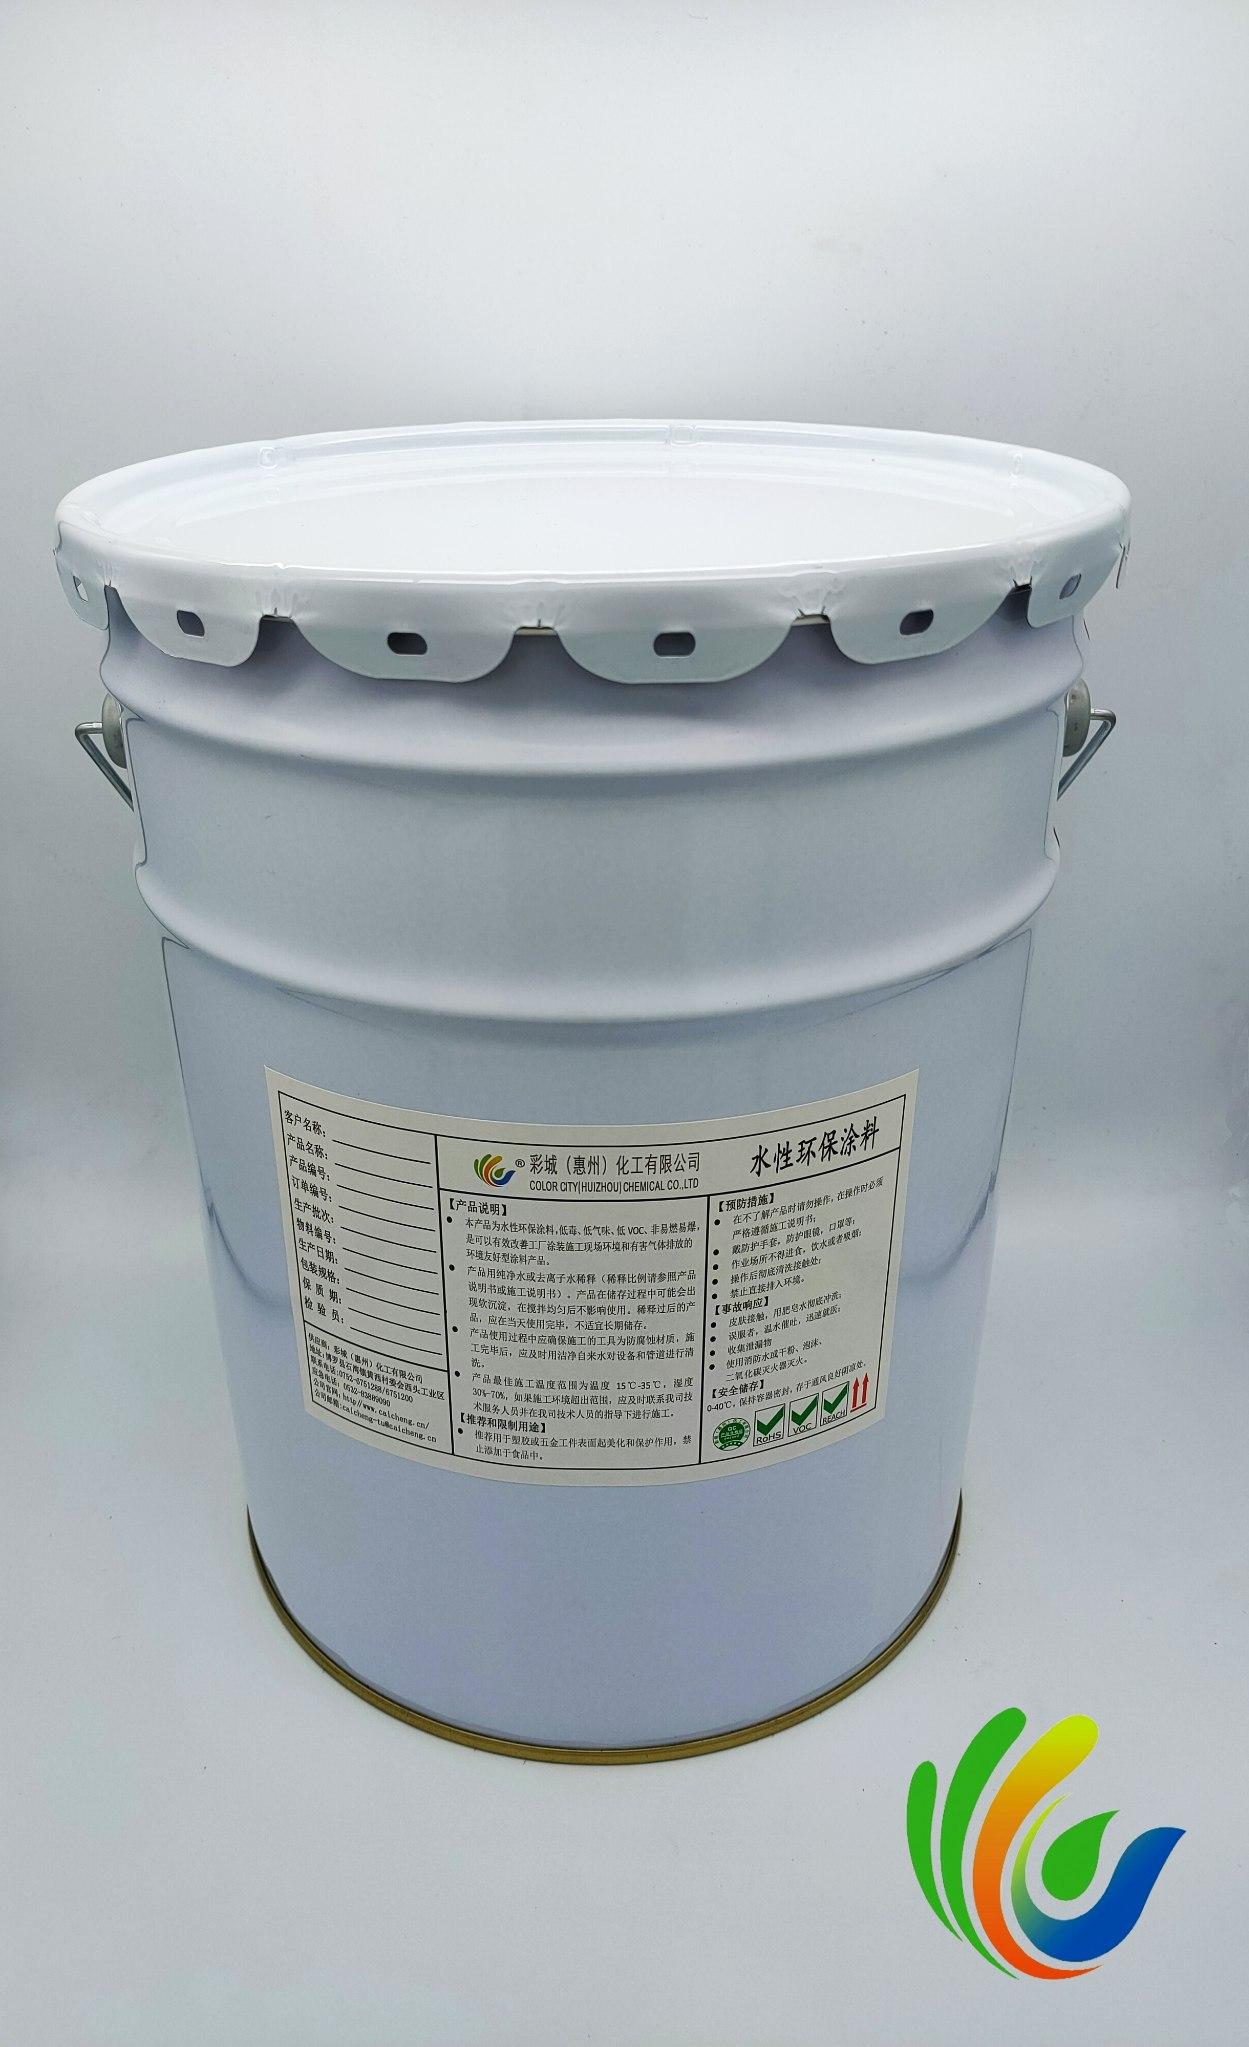 UV系列油漆产品